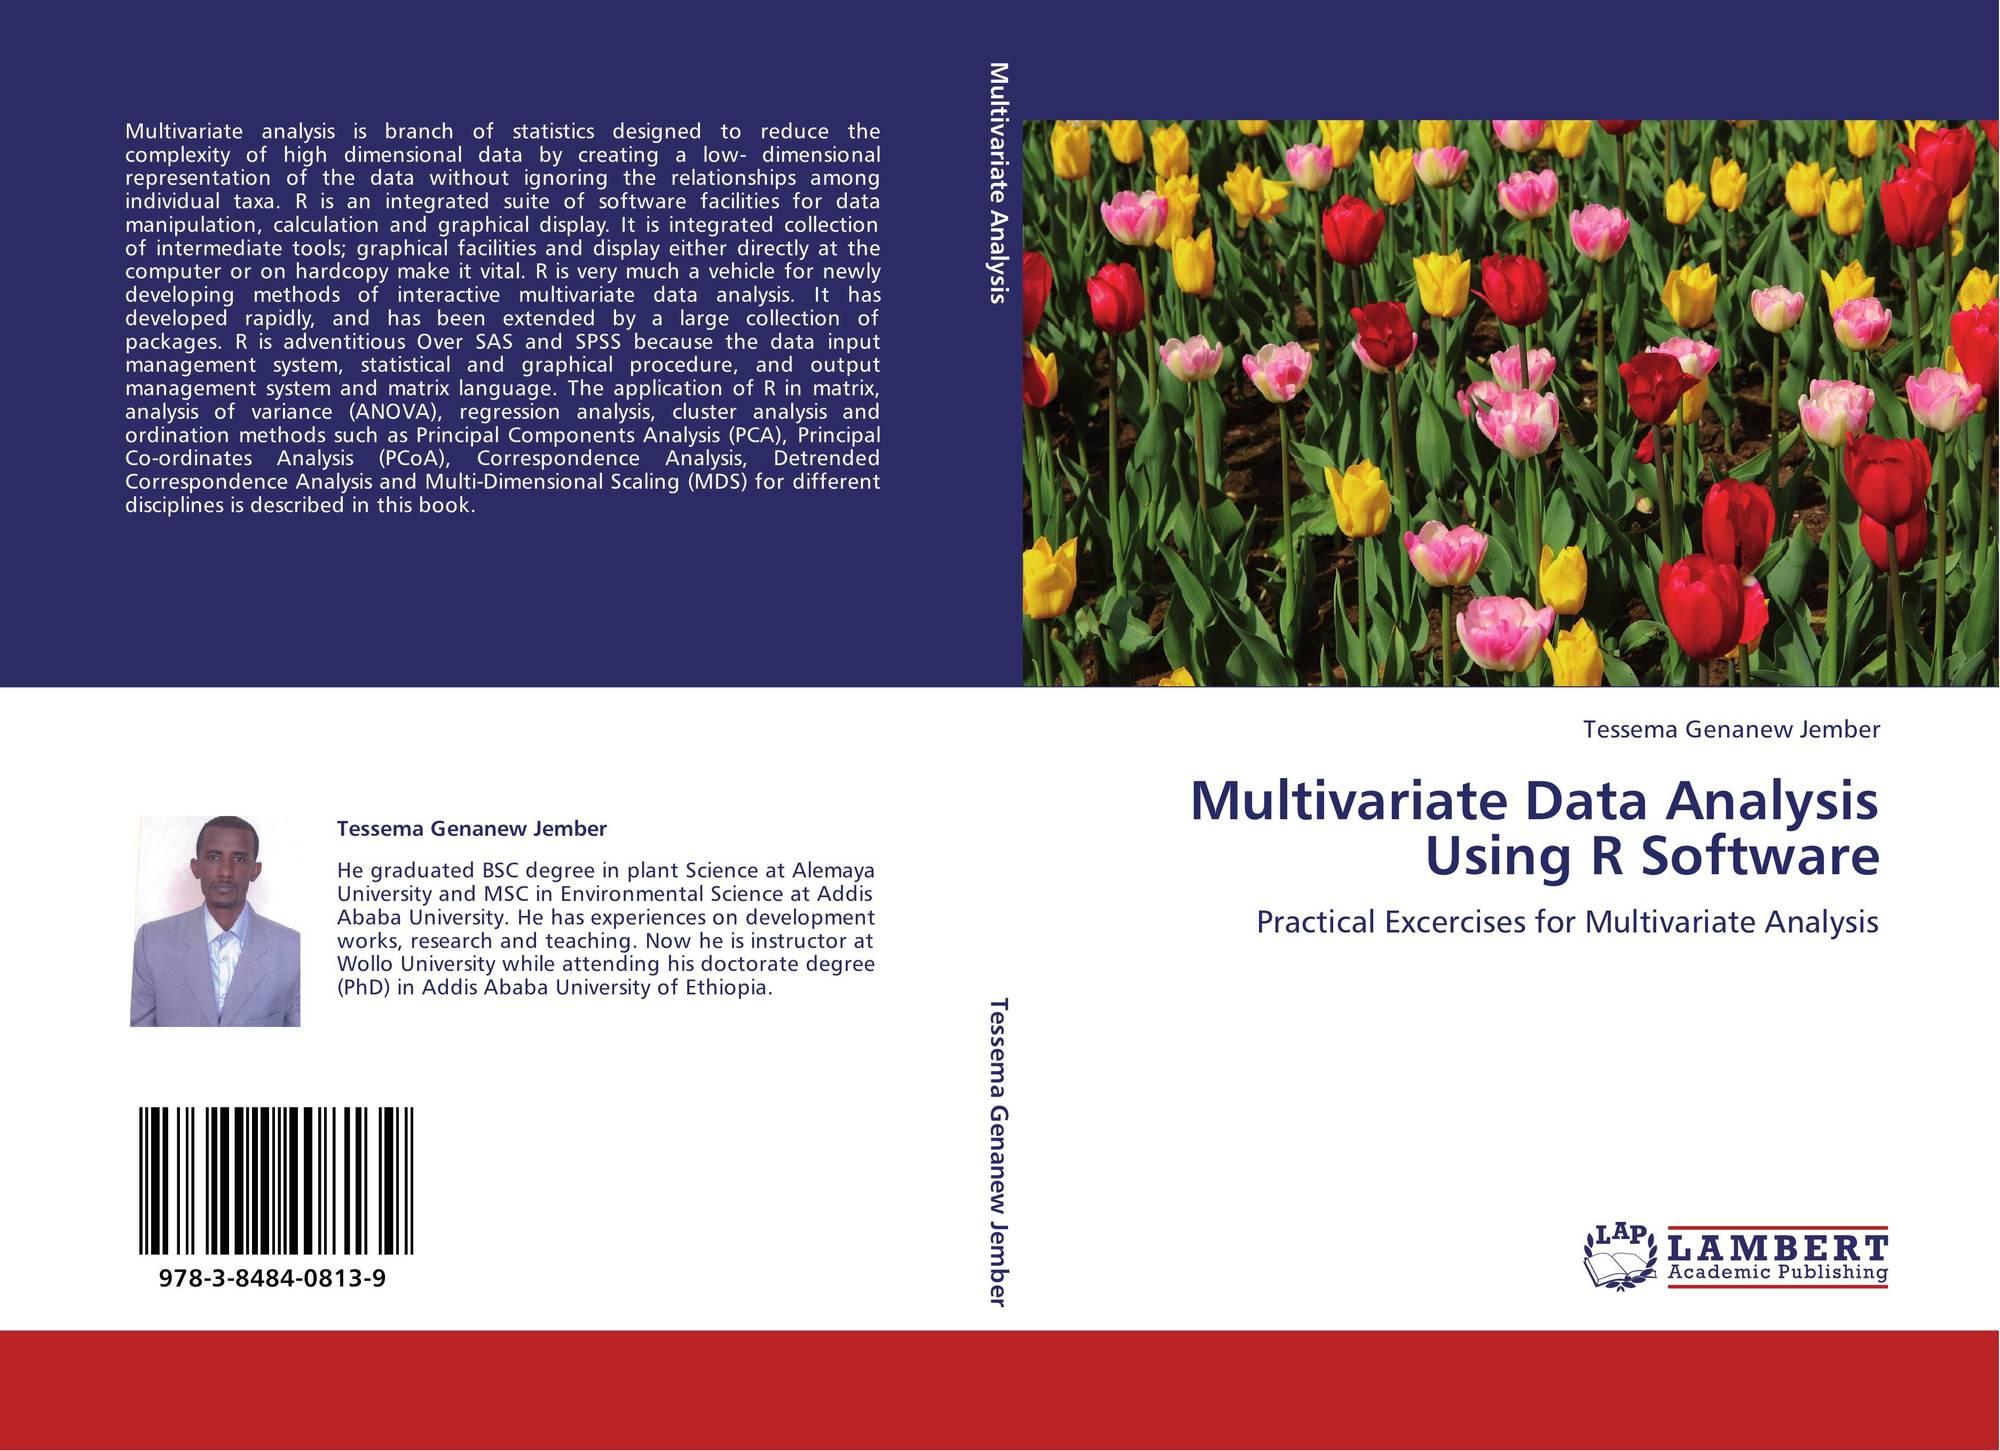 Multivariate Data Analysis Using R Software, 978-3-8484-0813